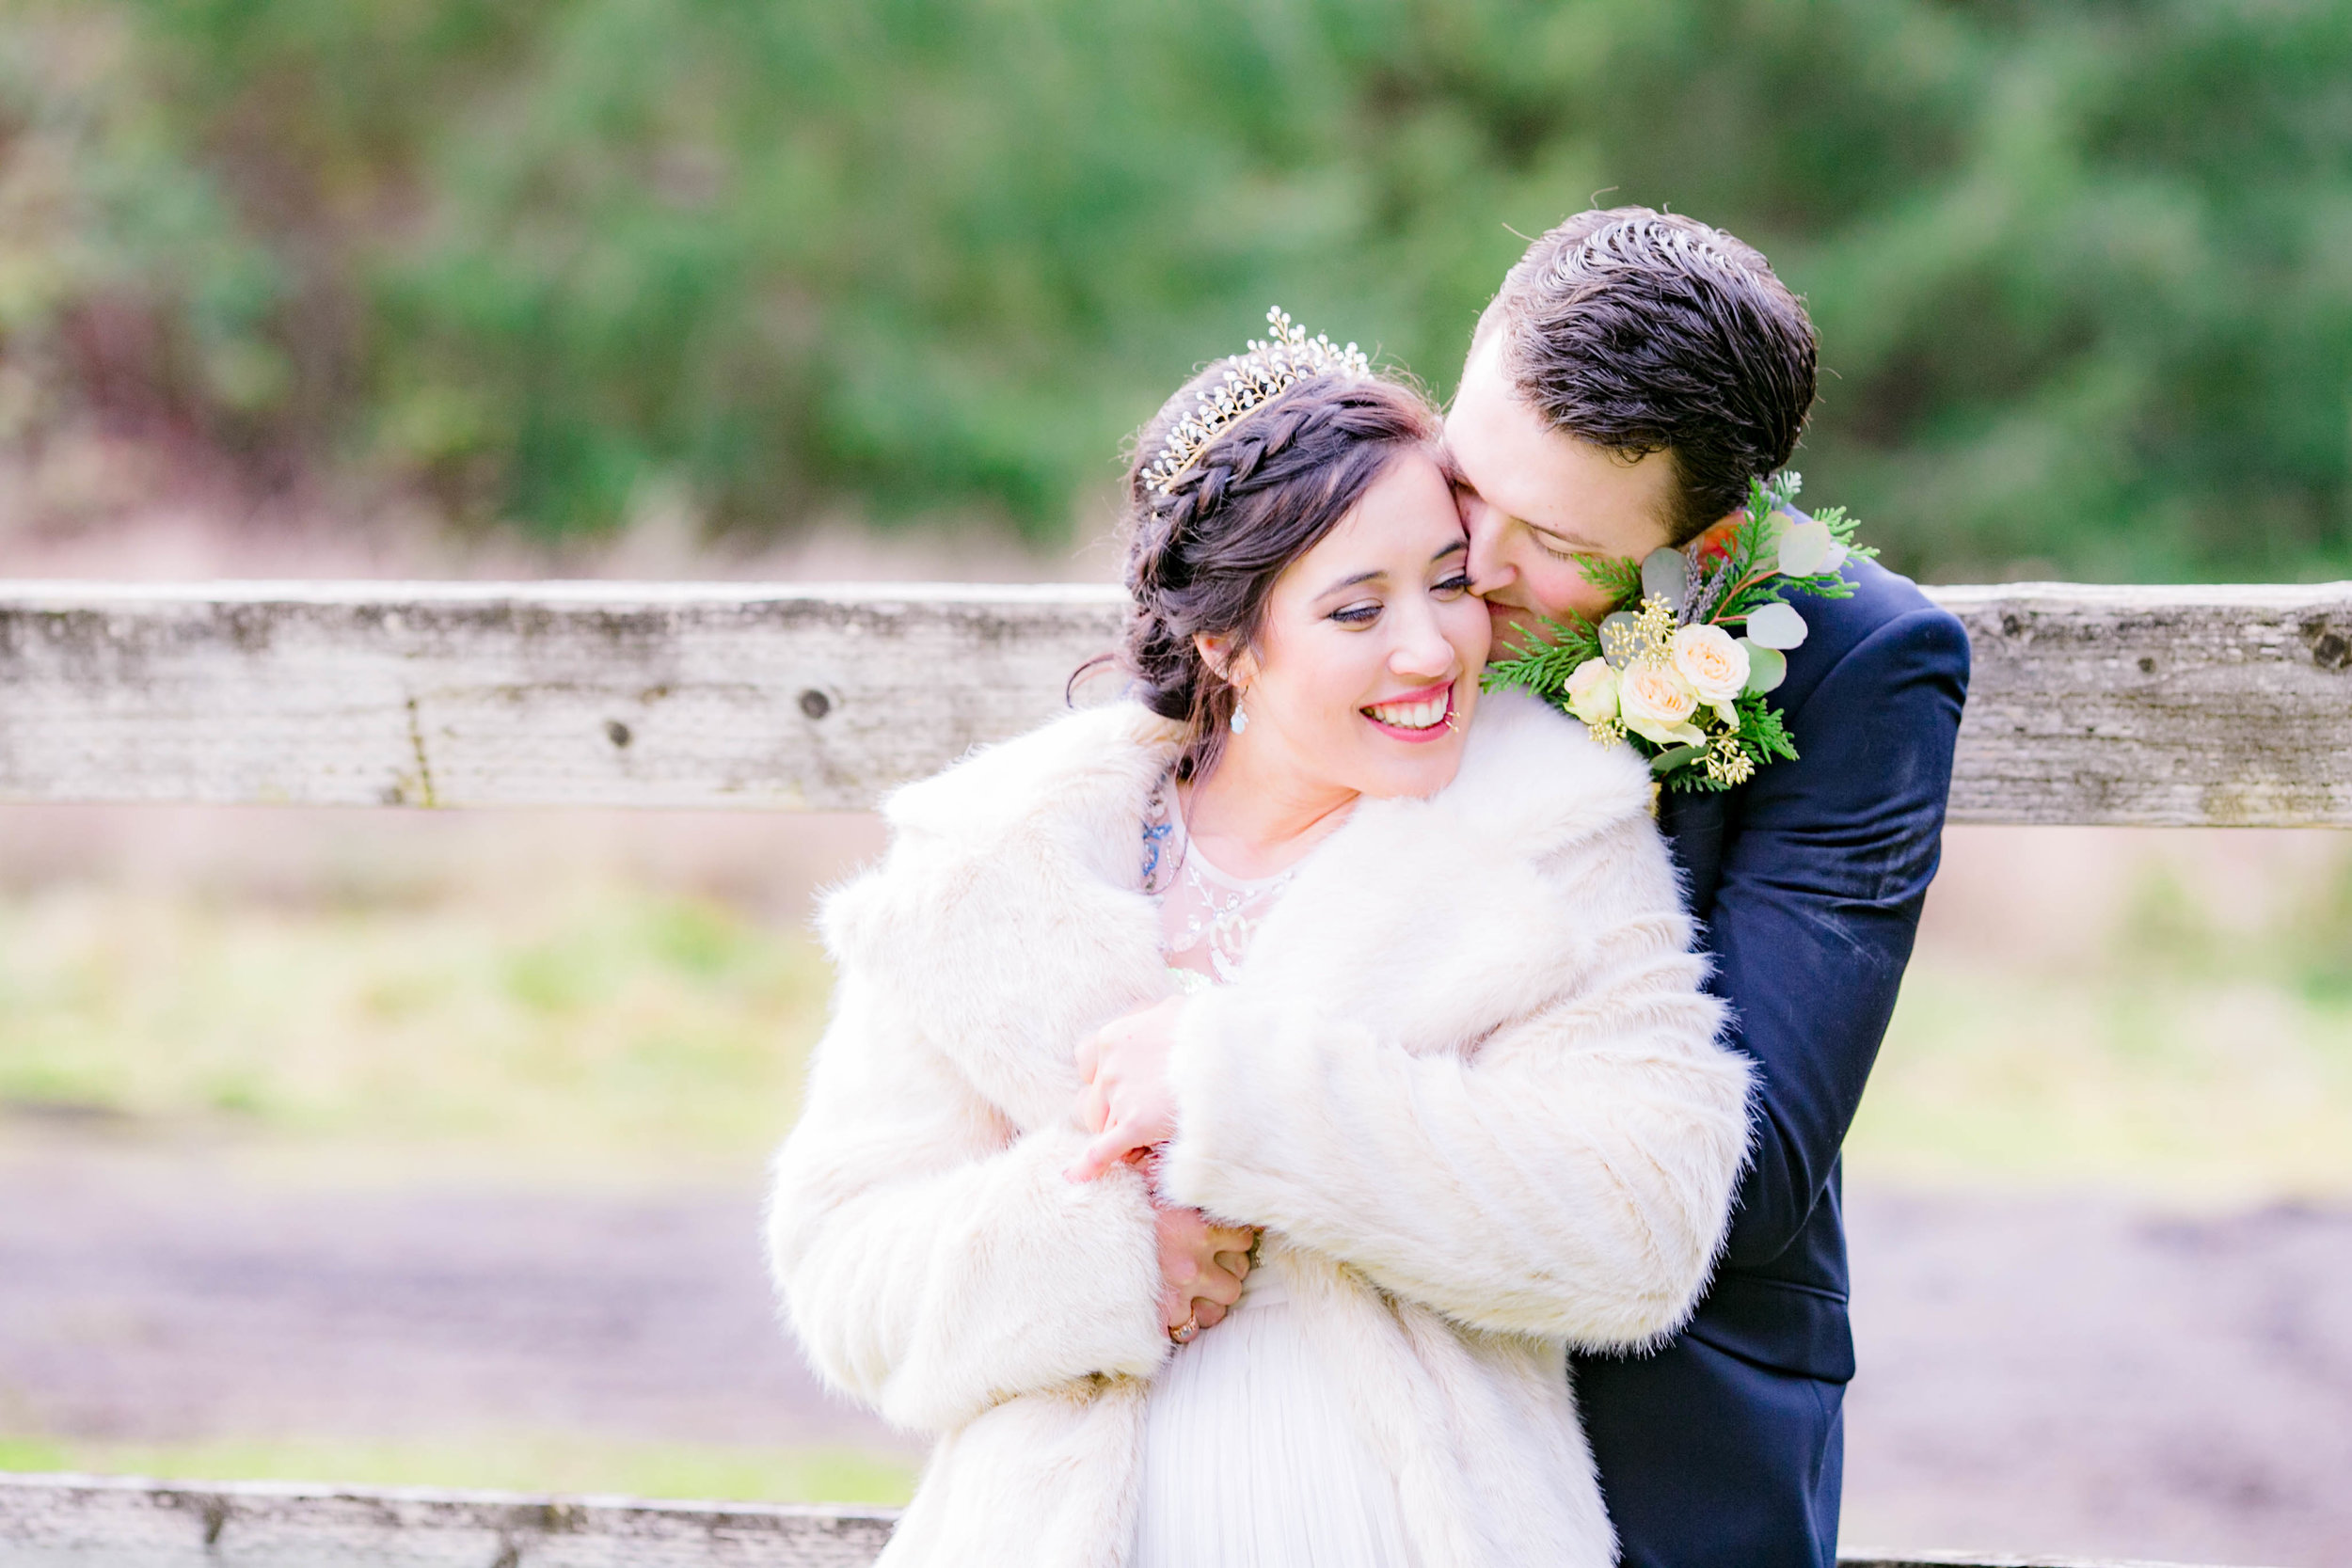 Bride and groom winter wedding portrait